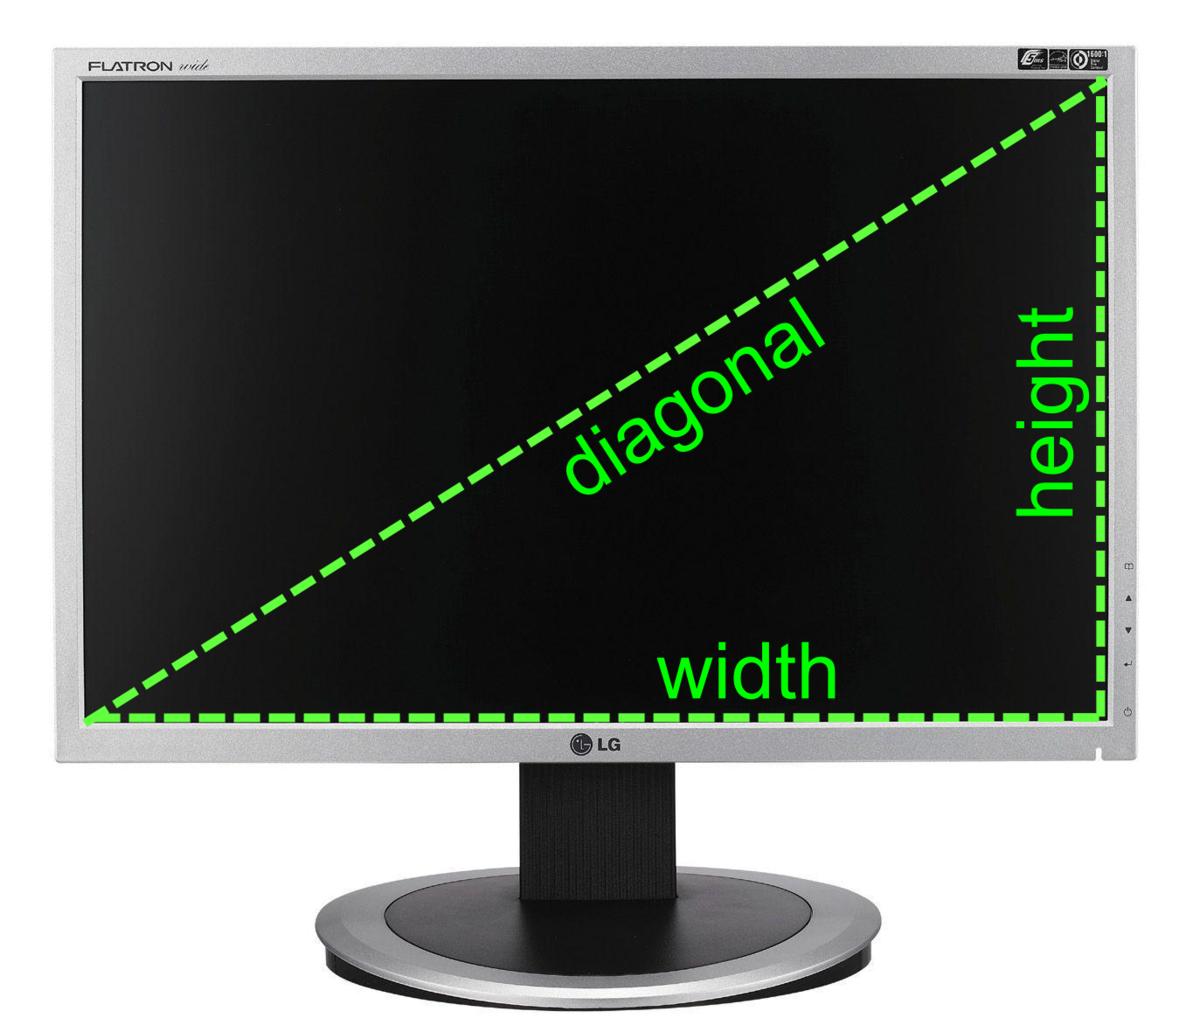 diagonal simple english wikipedia the free encyclopedia. Black Bedroom Furniture Sets. Home Design Ideas